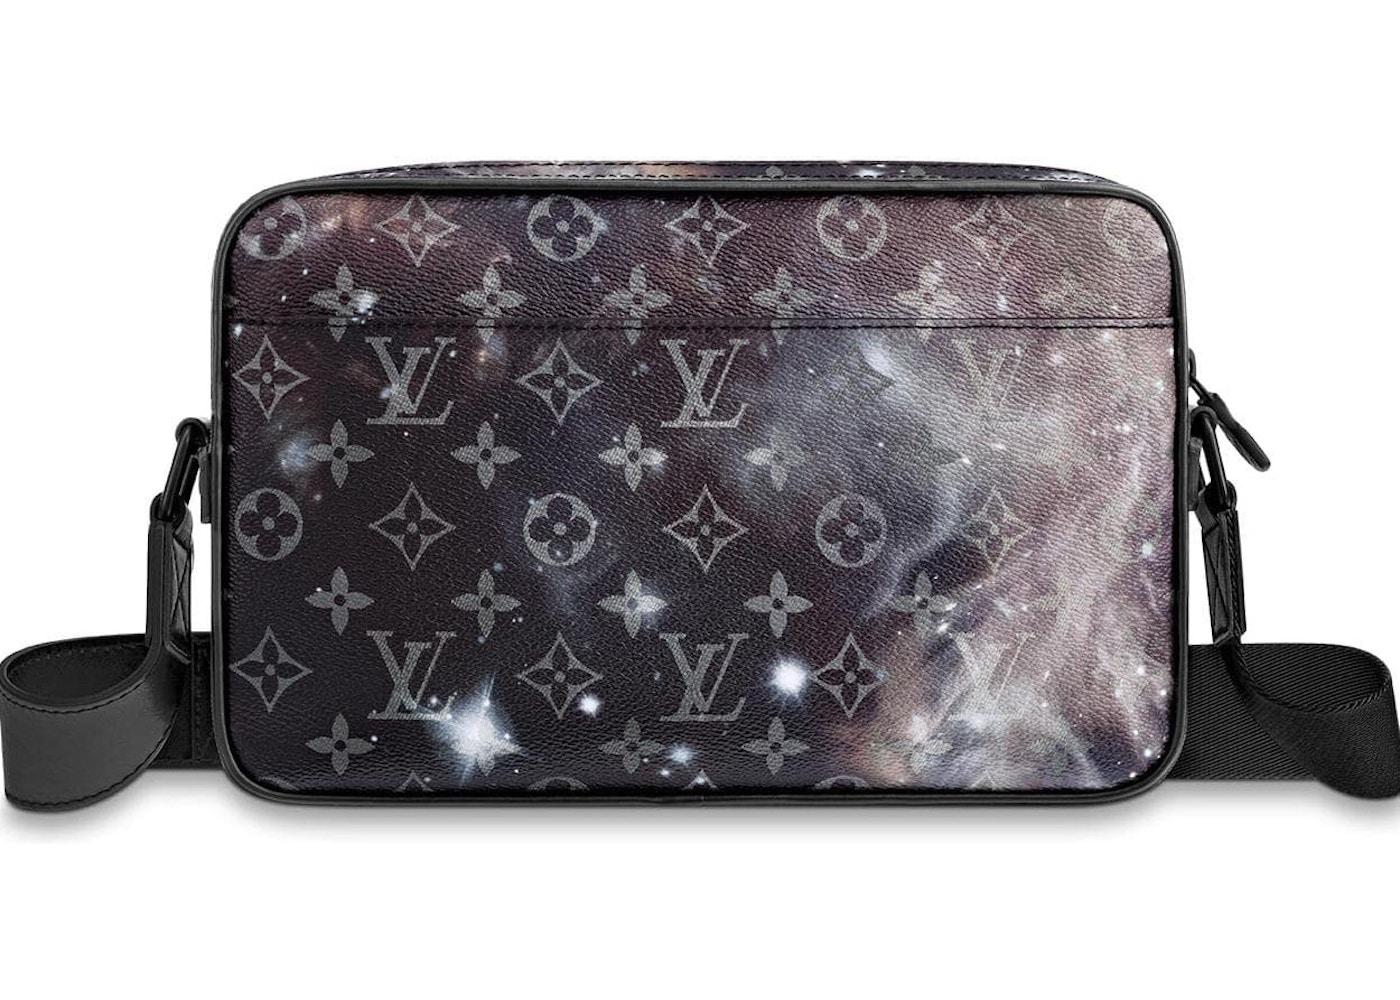 f133d0ae21fb3 Louis Vuitton Messenger Alpha Monogram Galaxy Black Multicolor